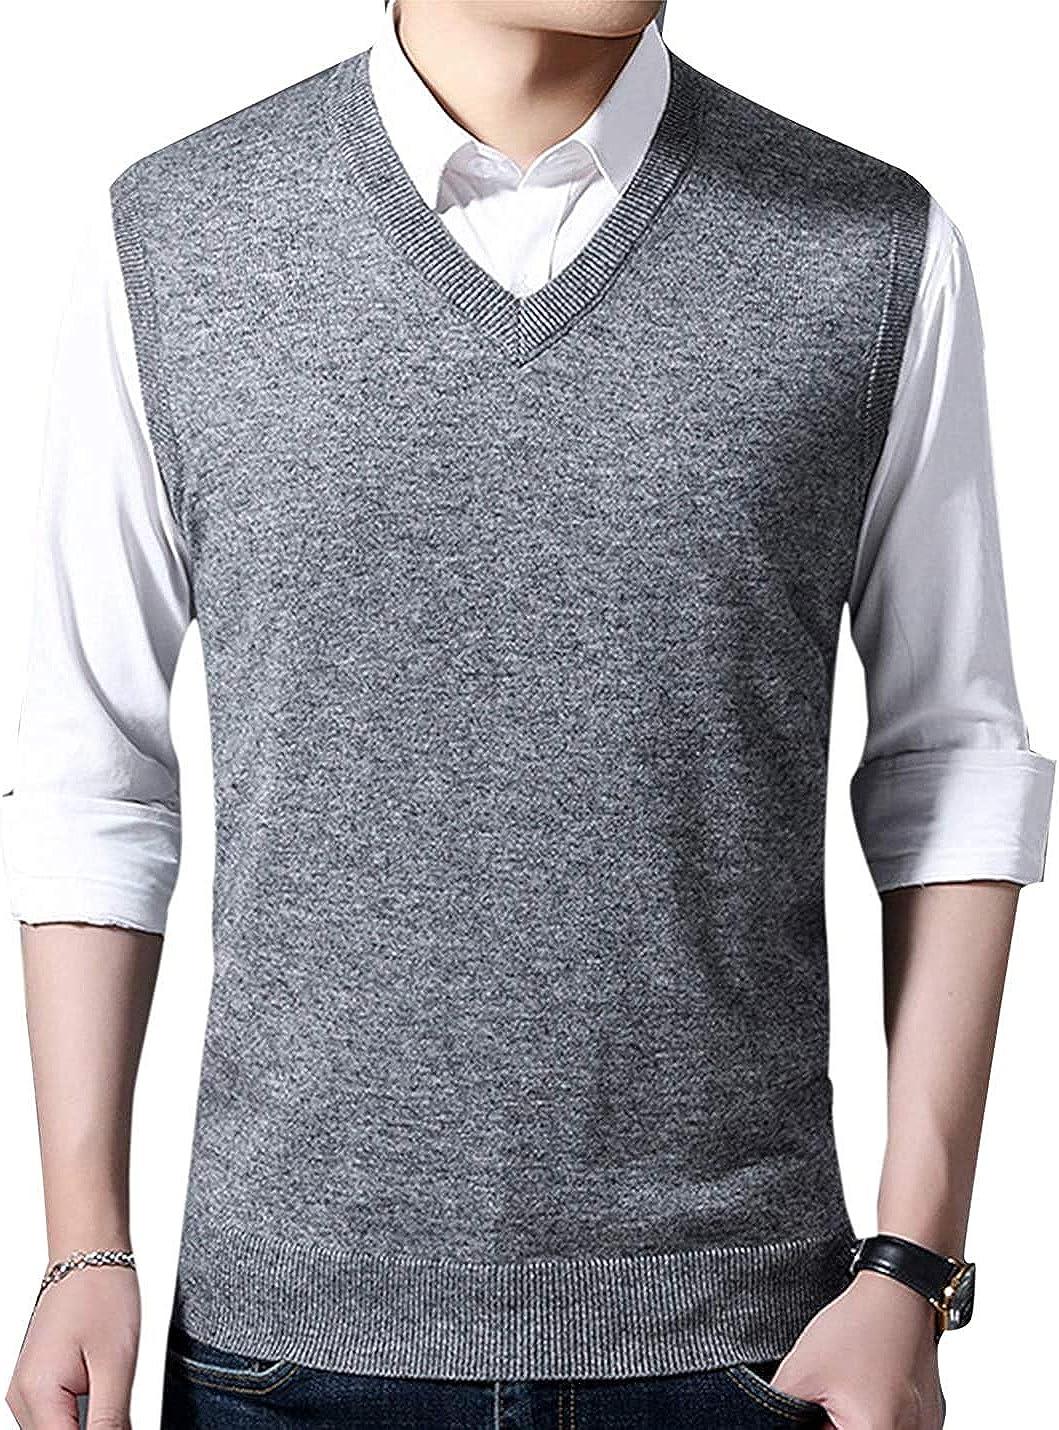 PAODIKUAI Mens V Neck Sweater Vest Cashmere Wool Blend Knit Sleeveless Sweater Pullover